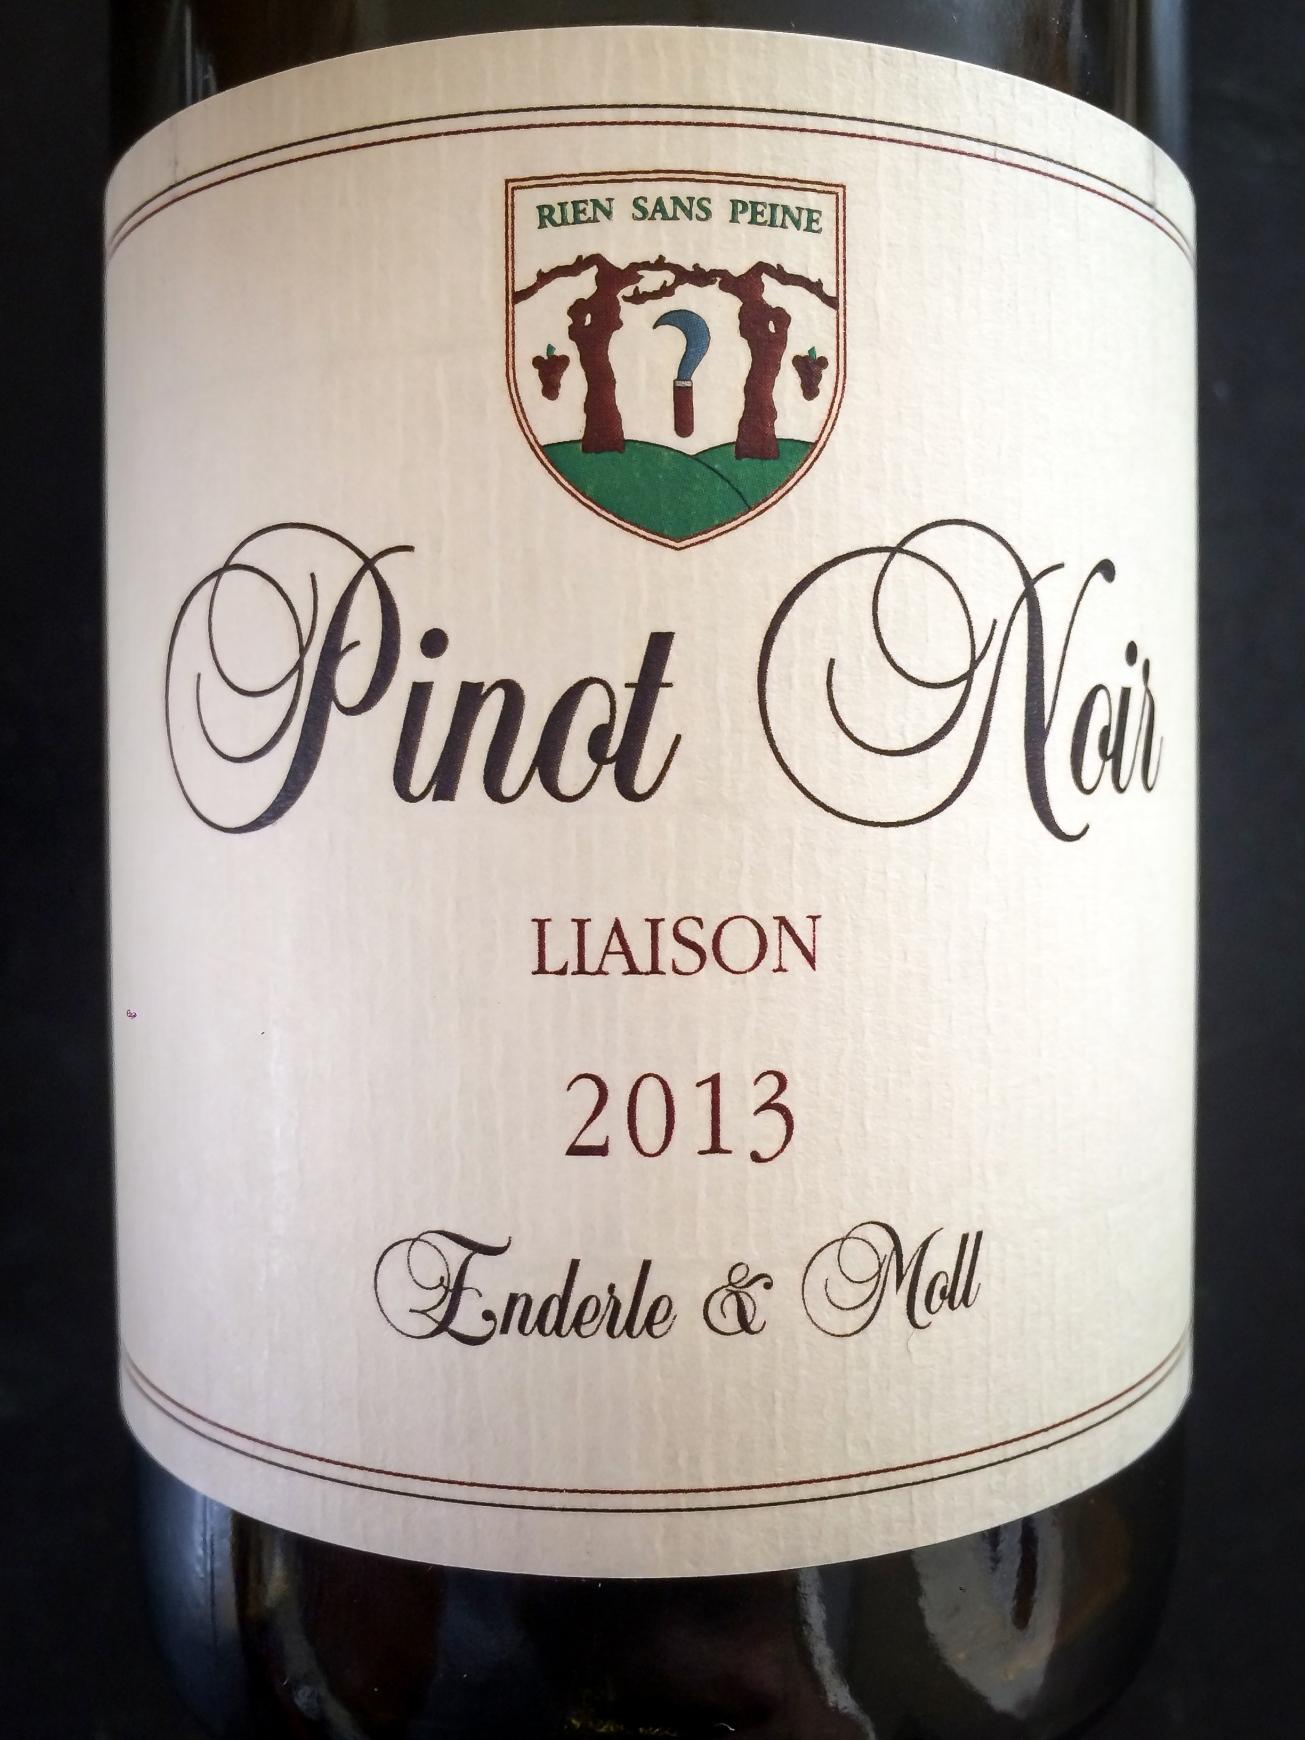 2013 Enderle & Moll Pinot Noir Liaison